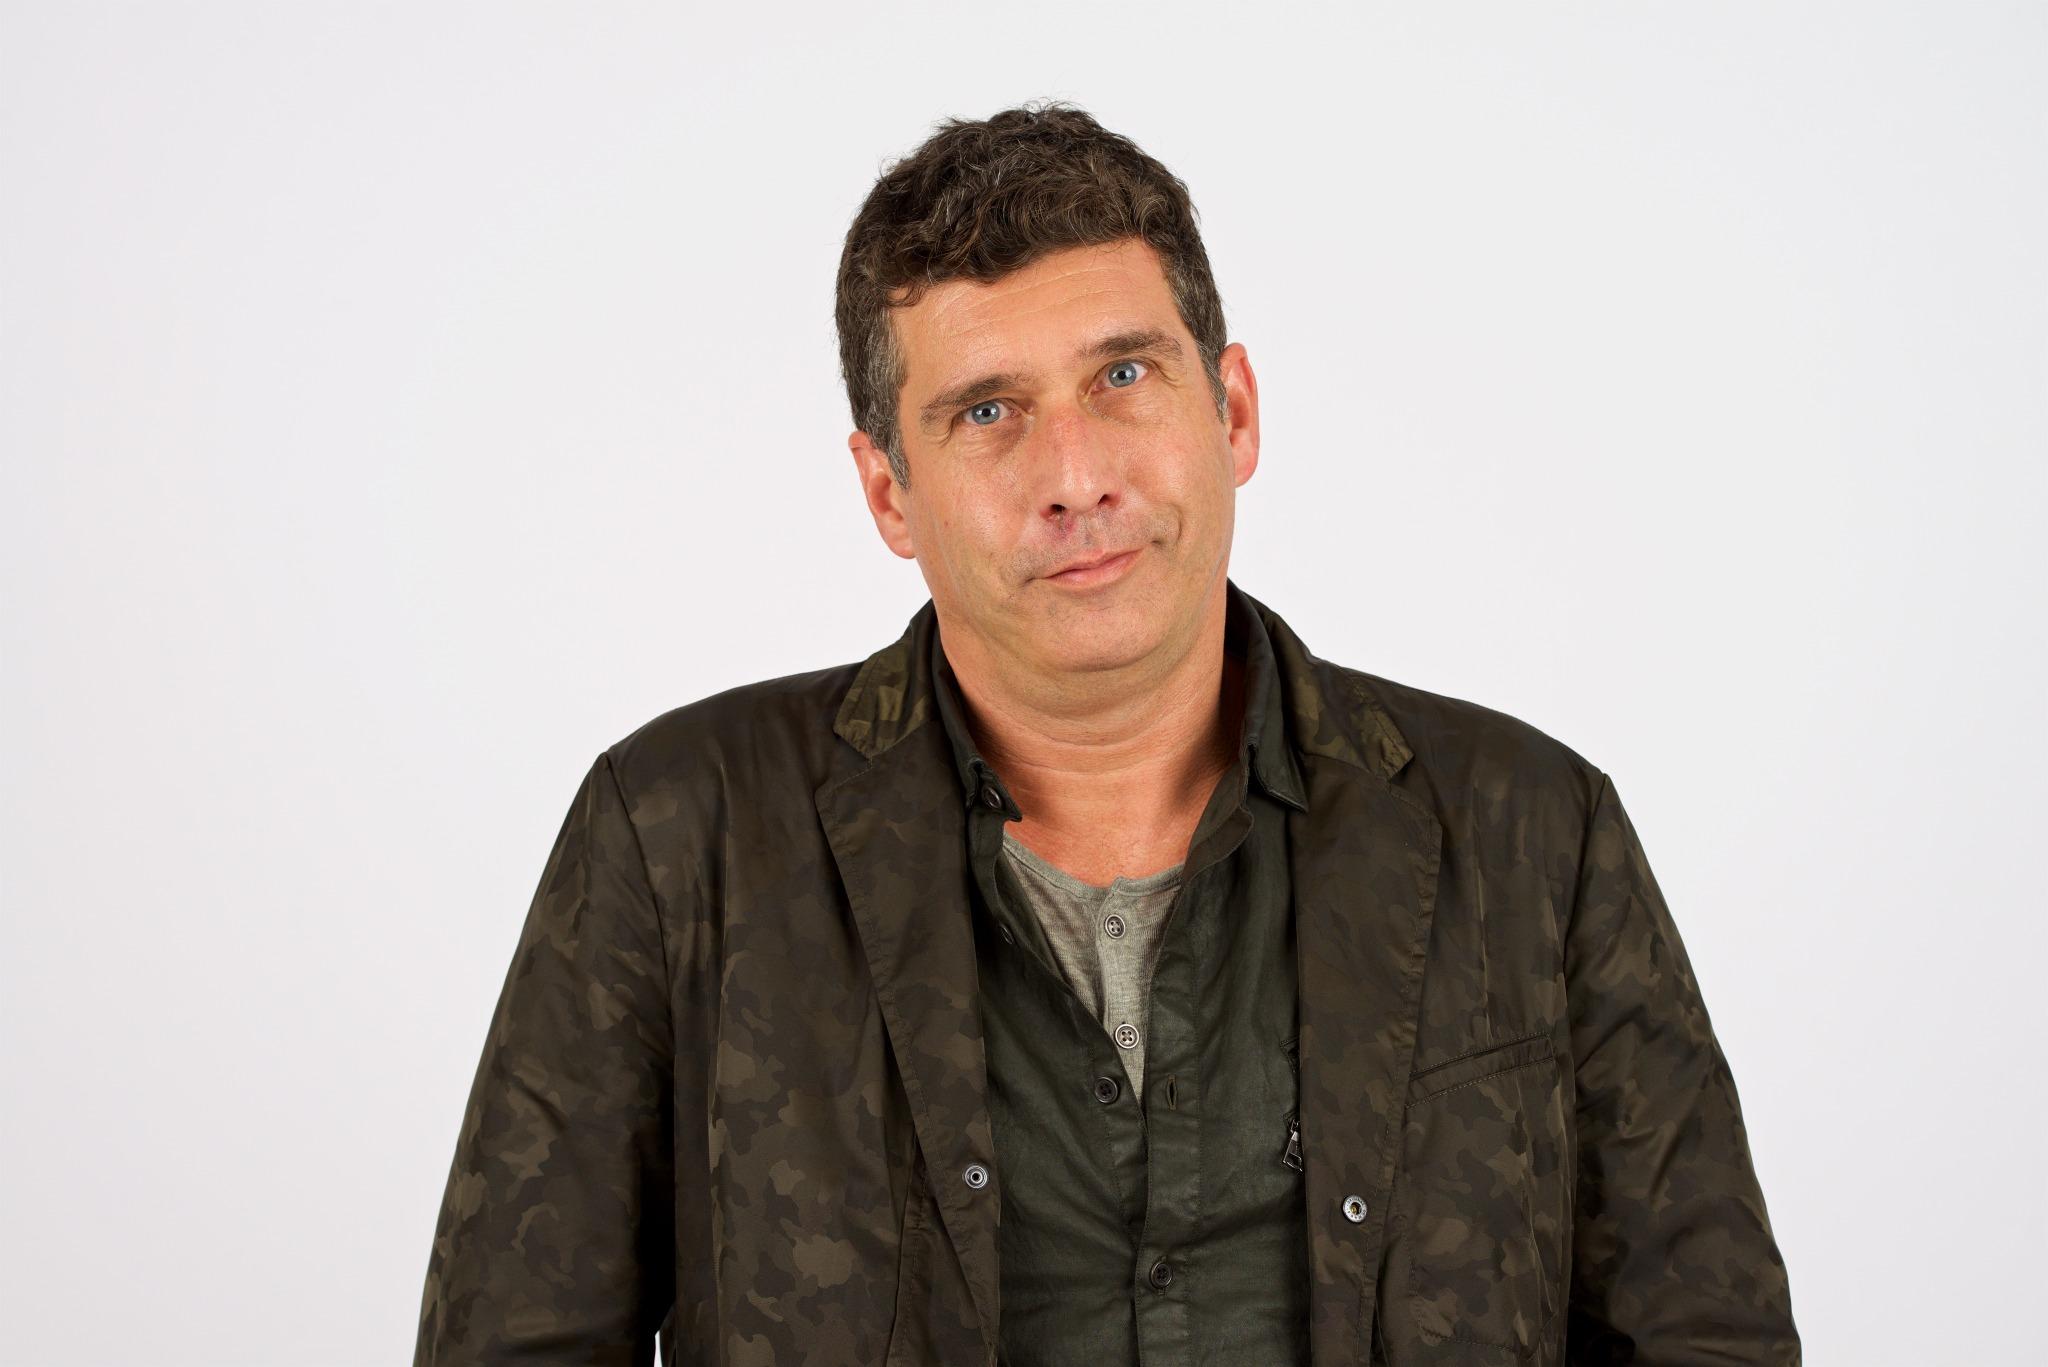 Dominique Piotet, Fabernovel